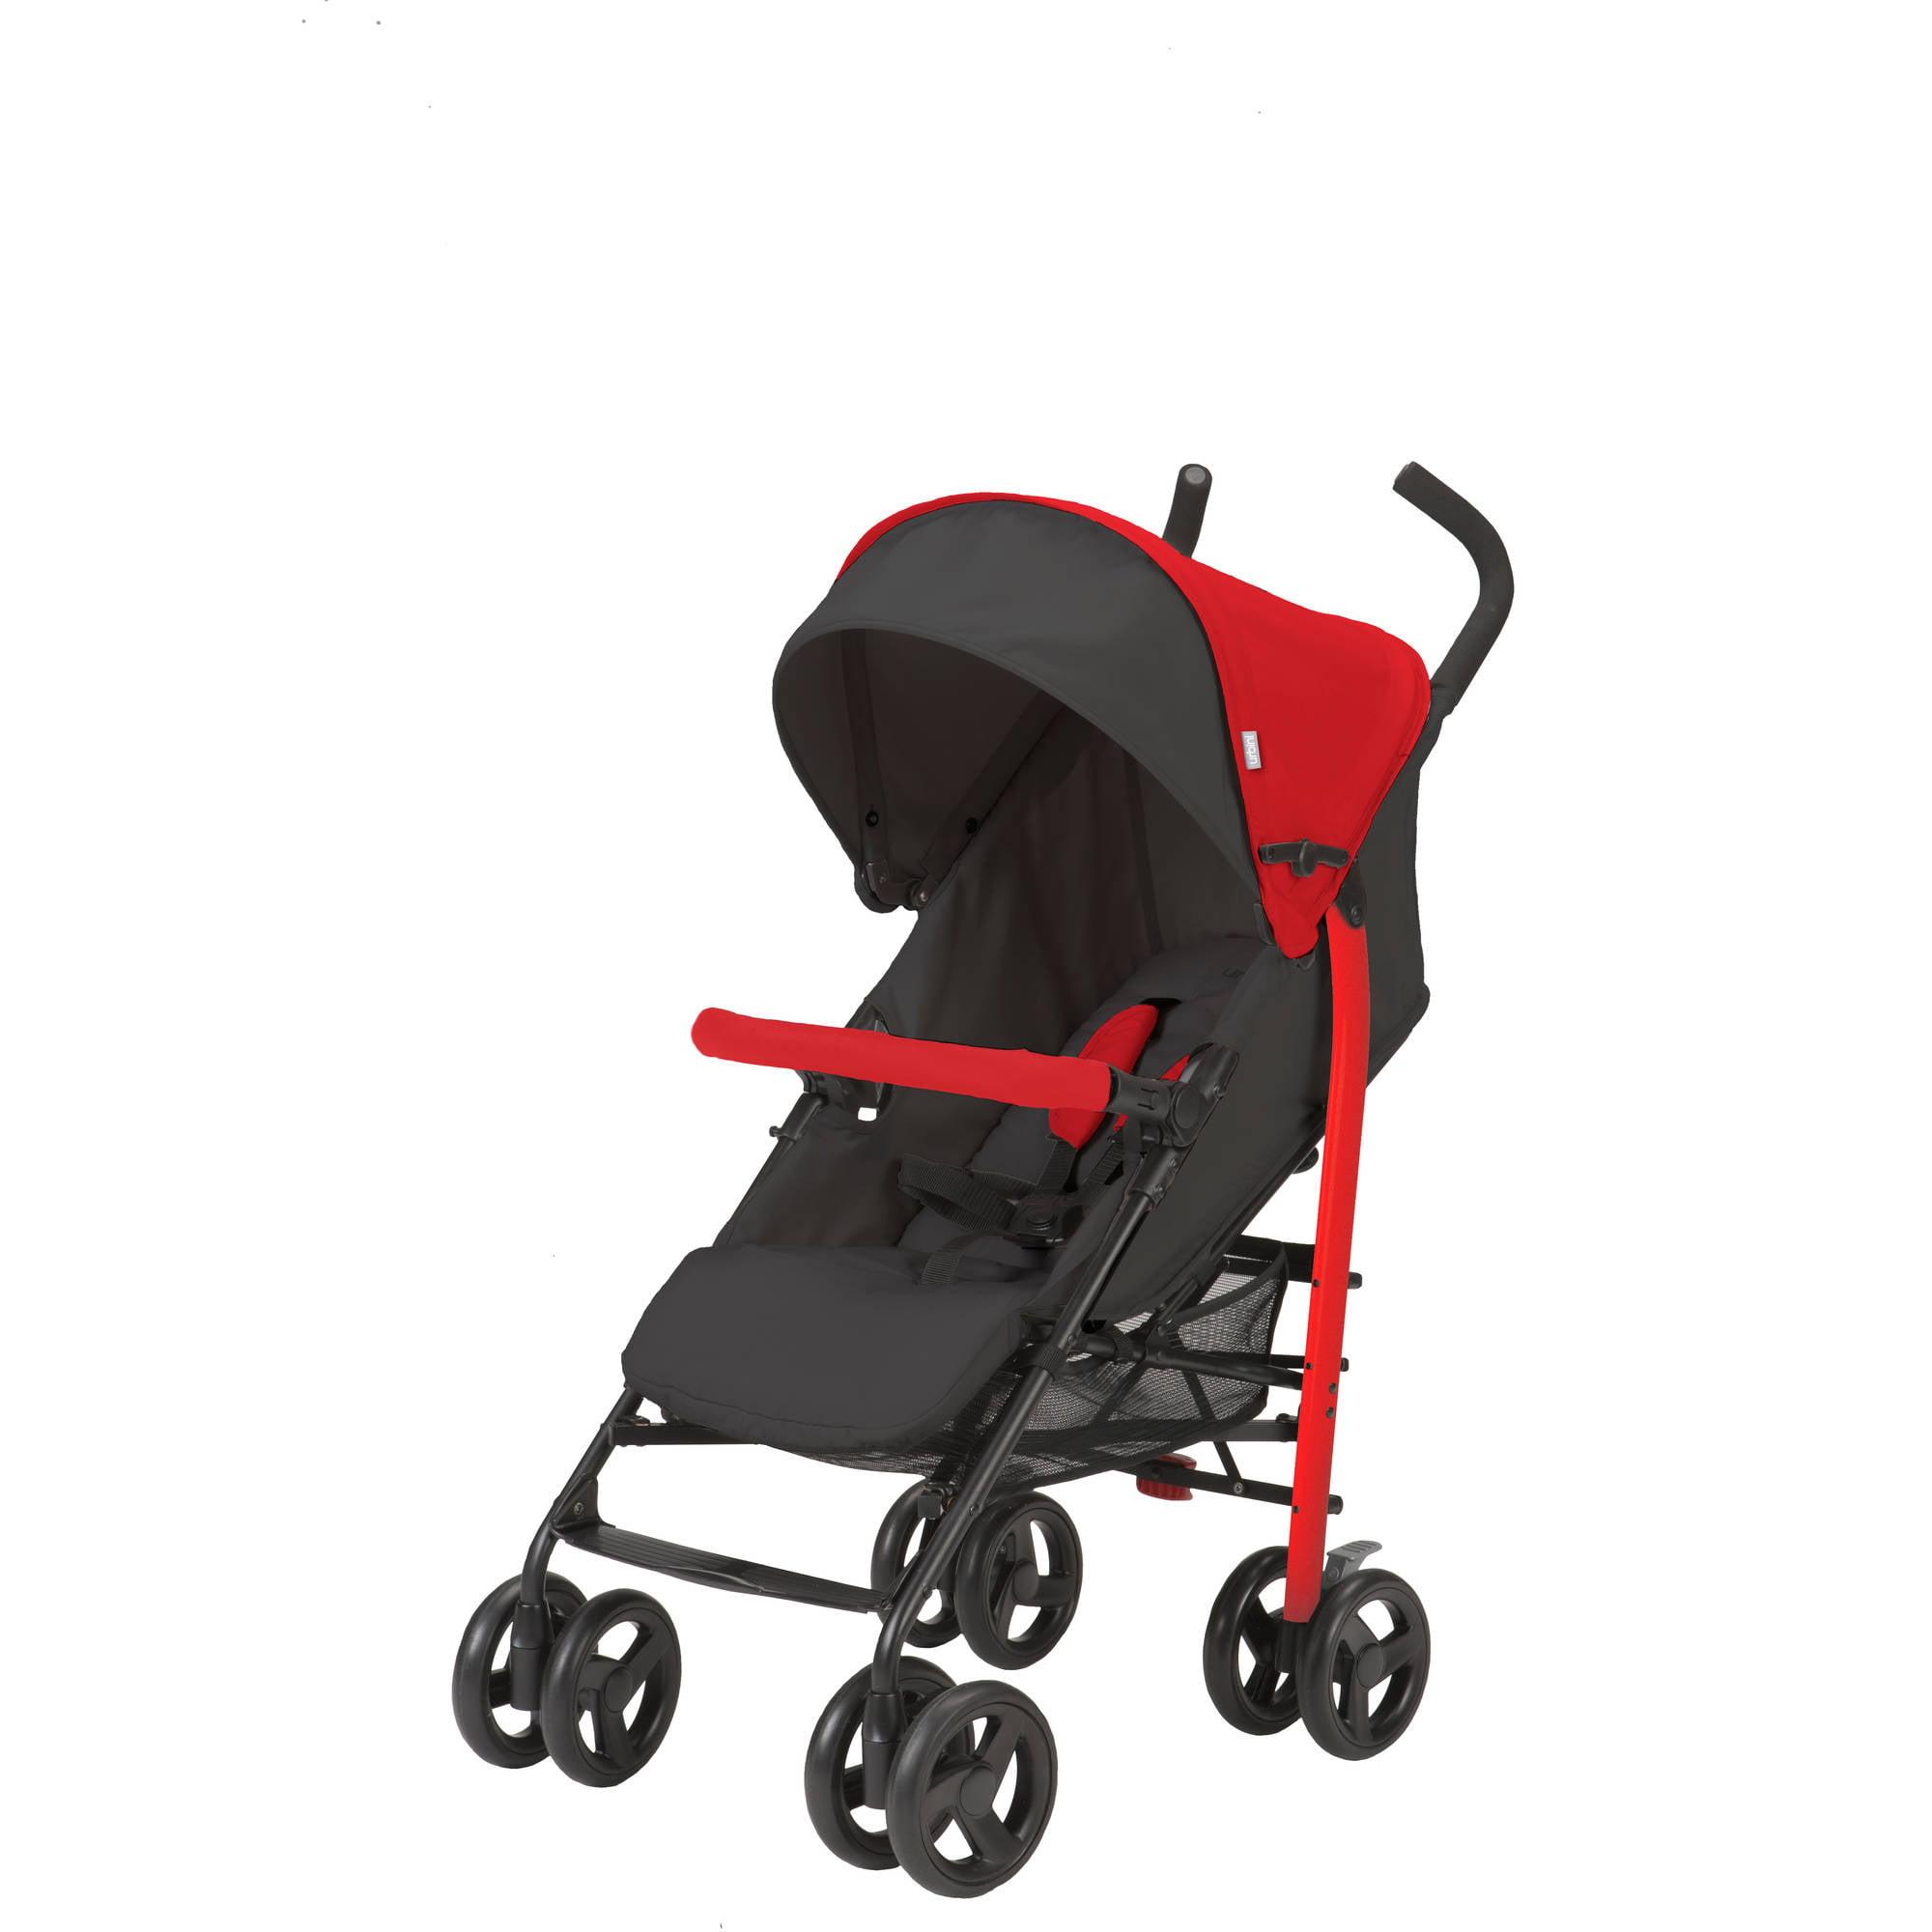 Urbini Swift Light Stroller, Red by Urbini